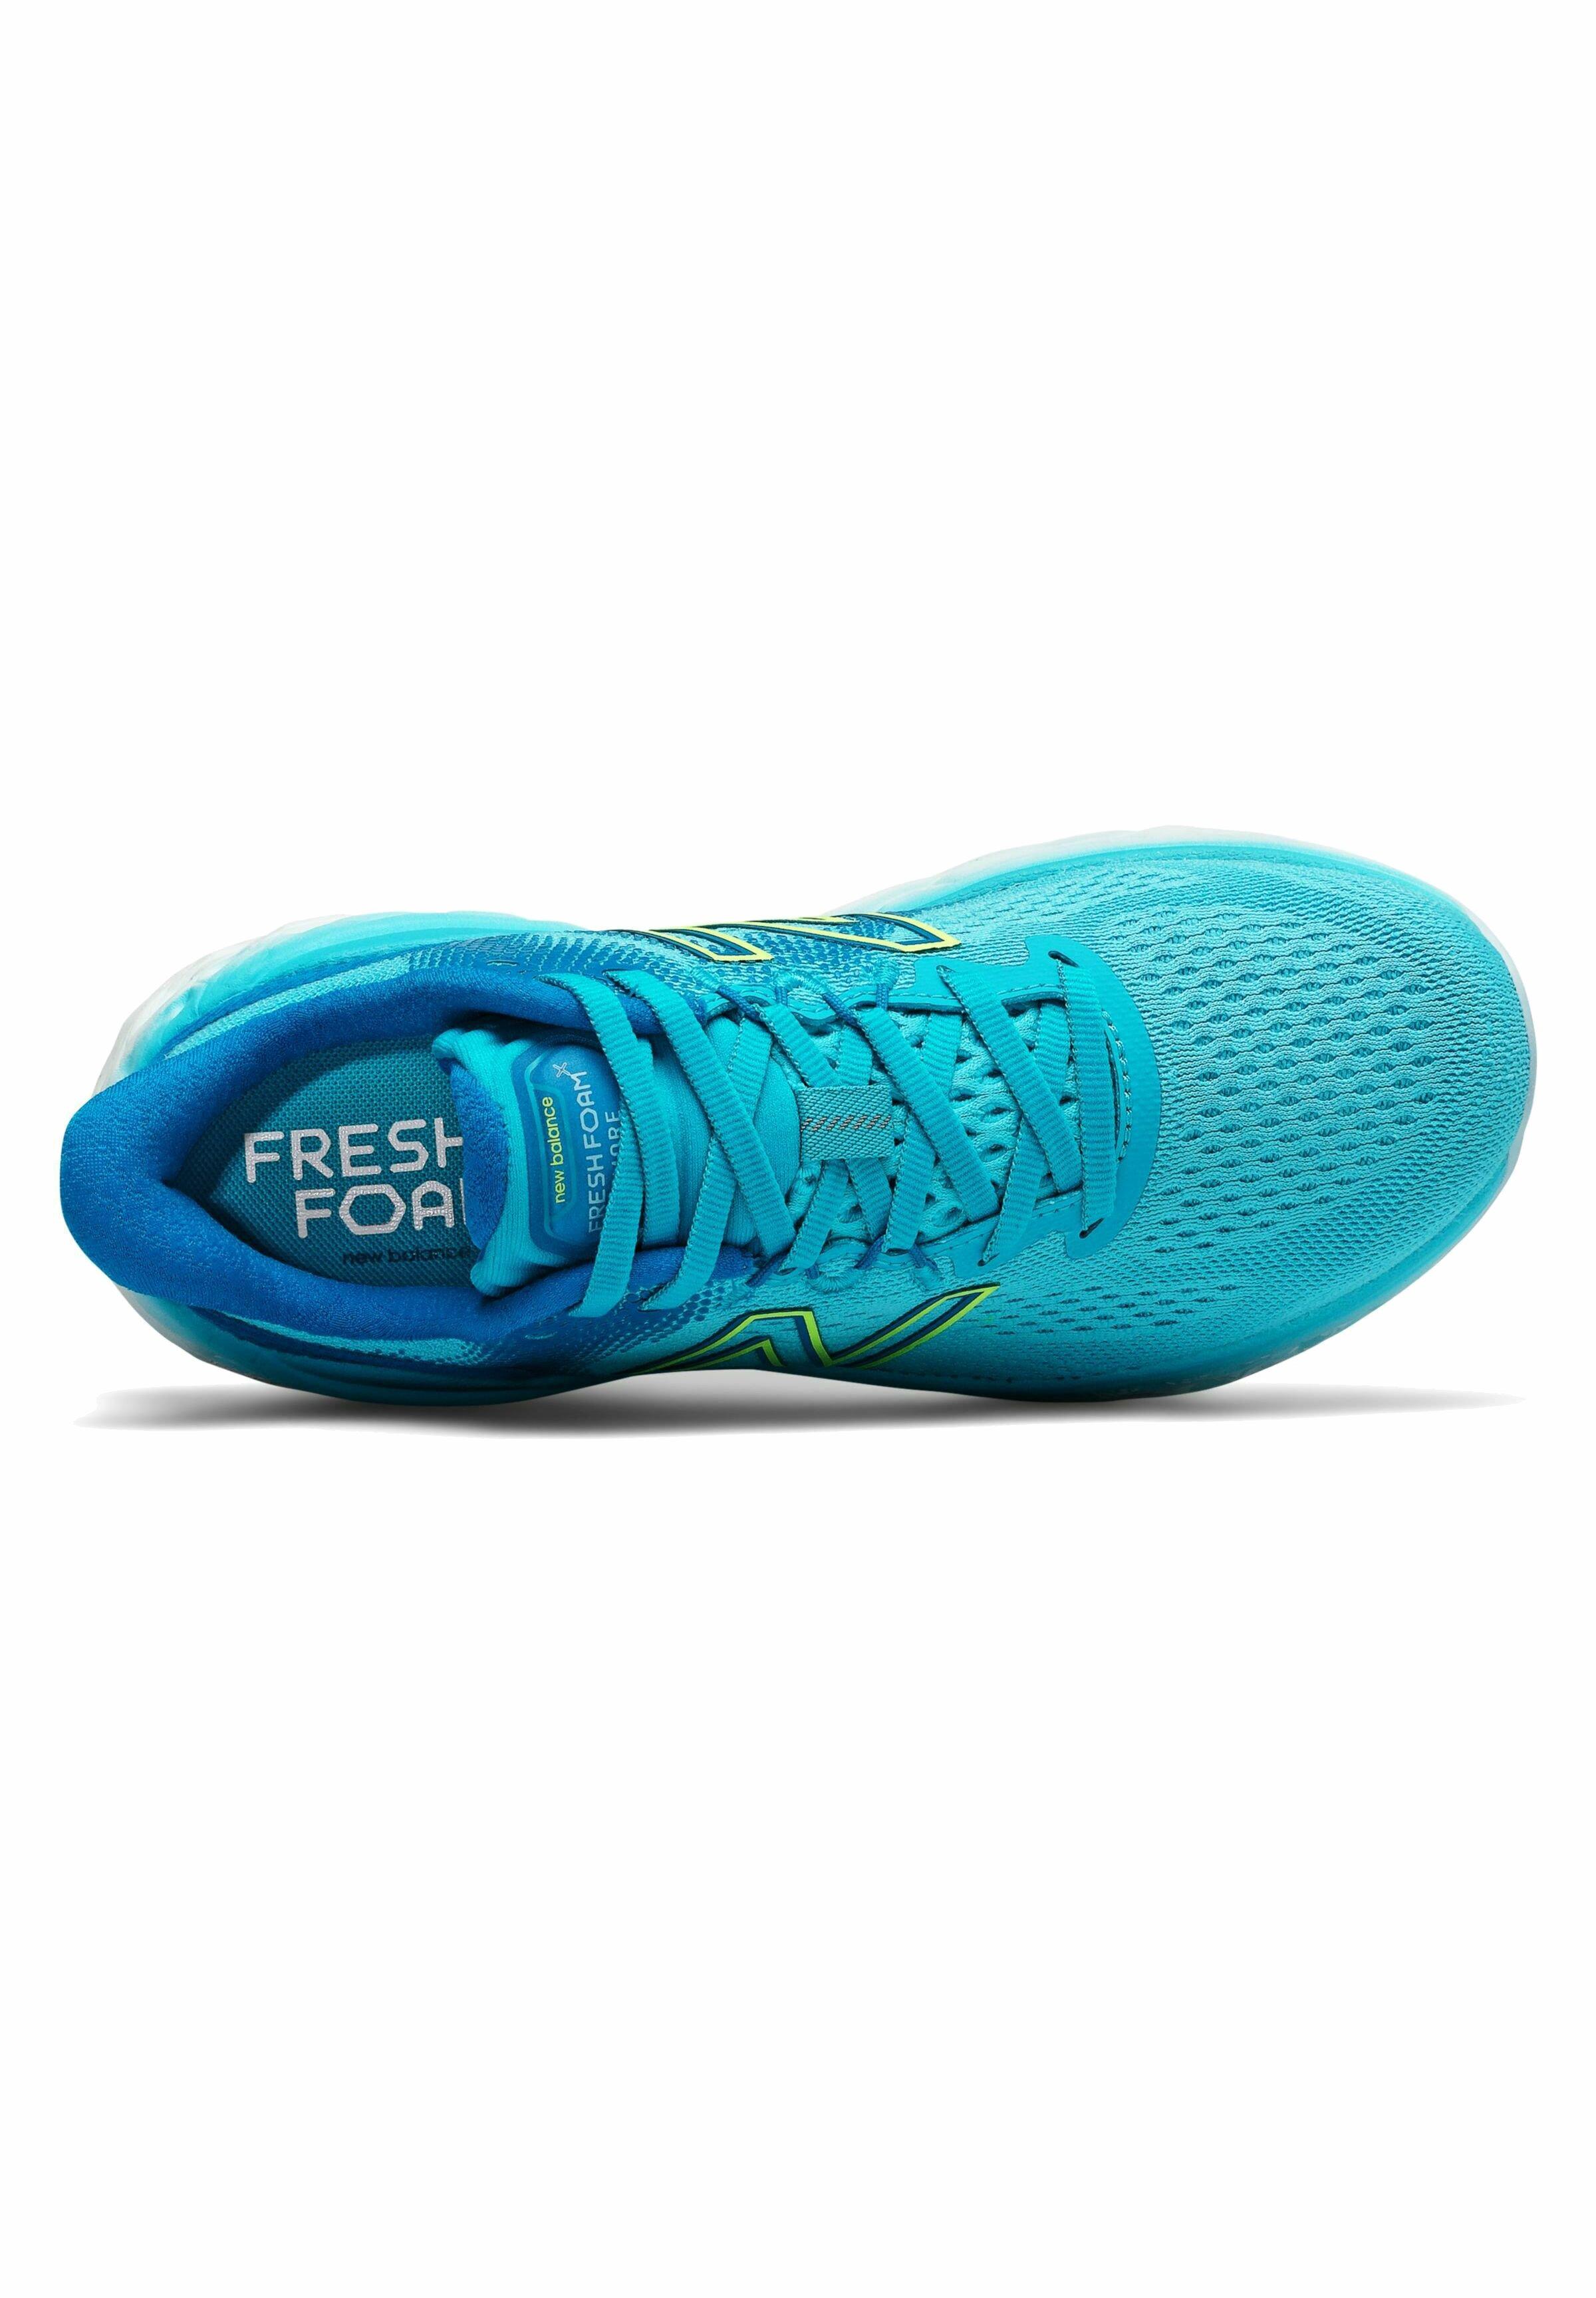 Scarpe da trail running - turquoise